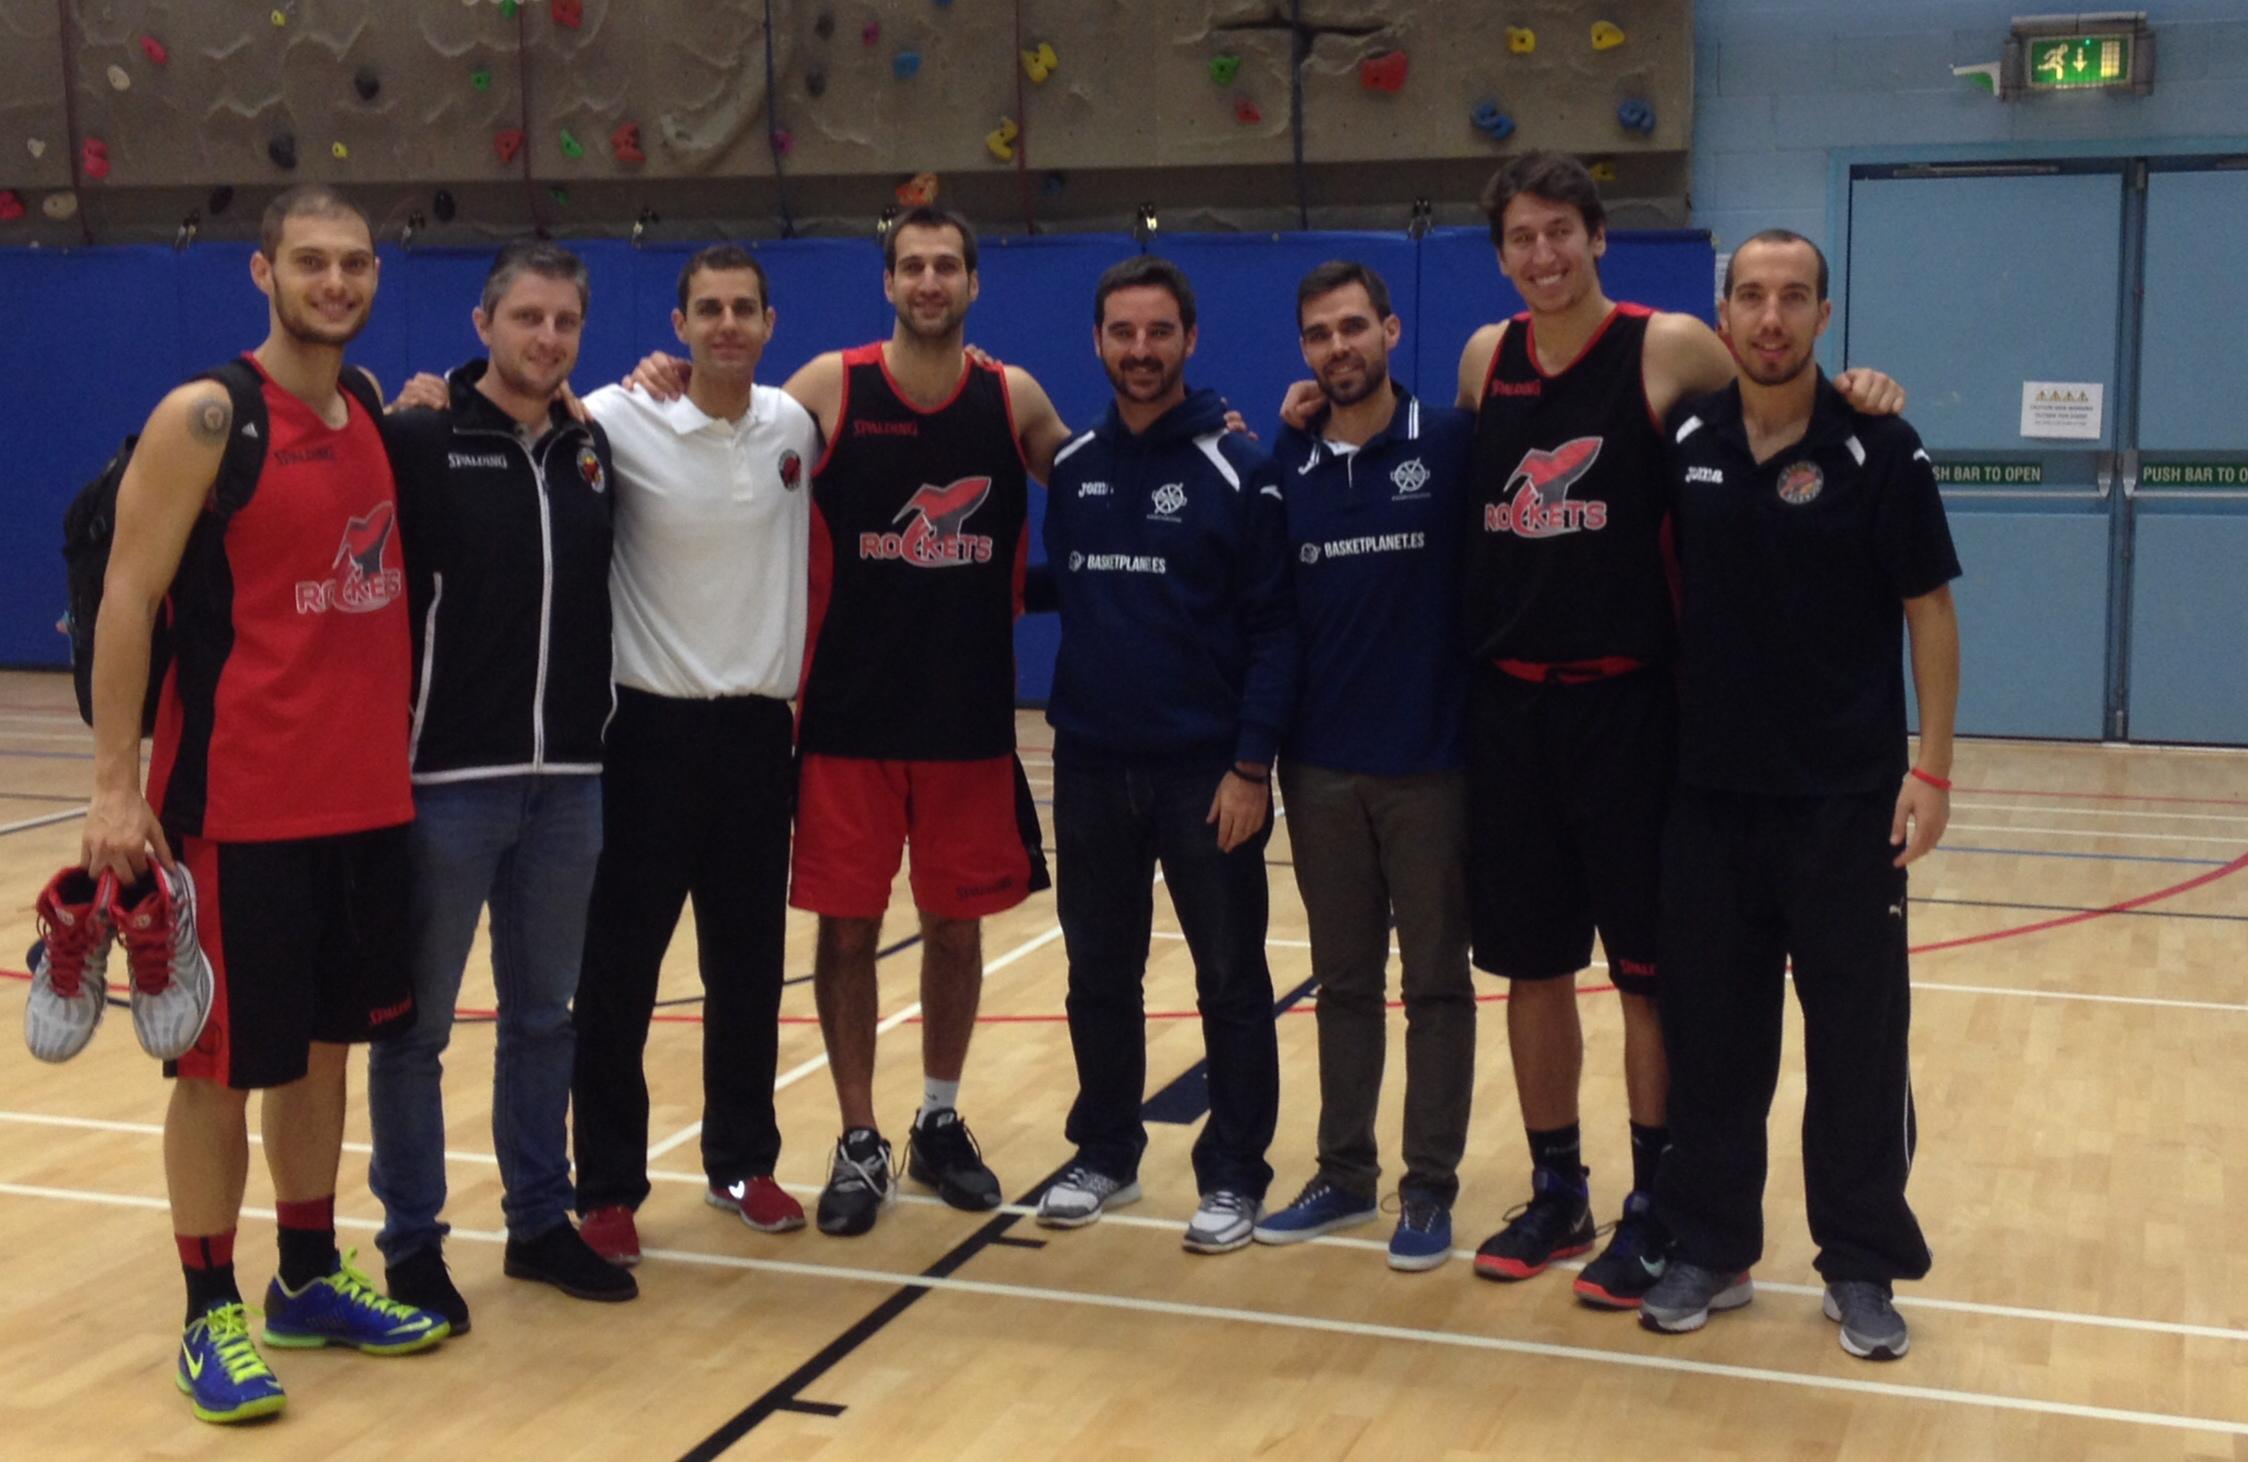 Españoles del Reading Rockets